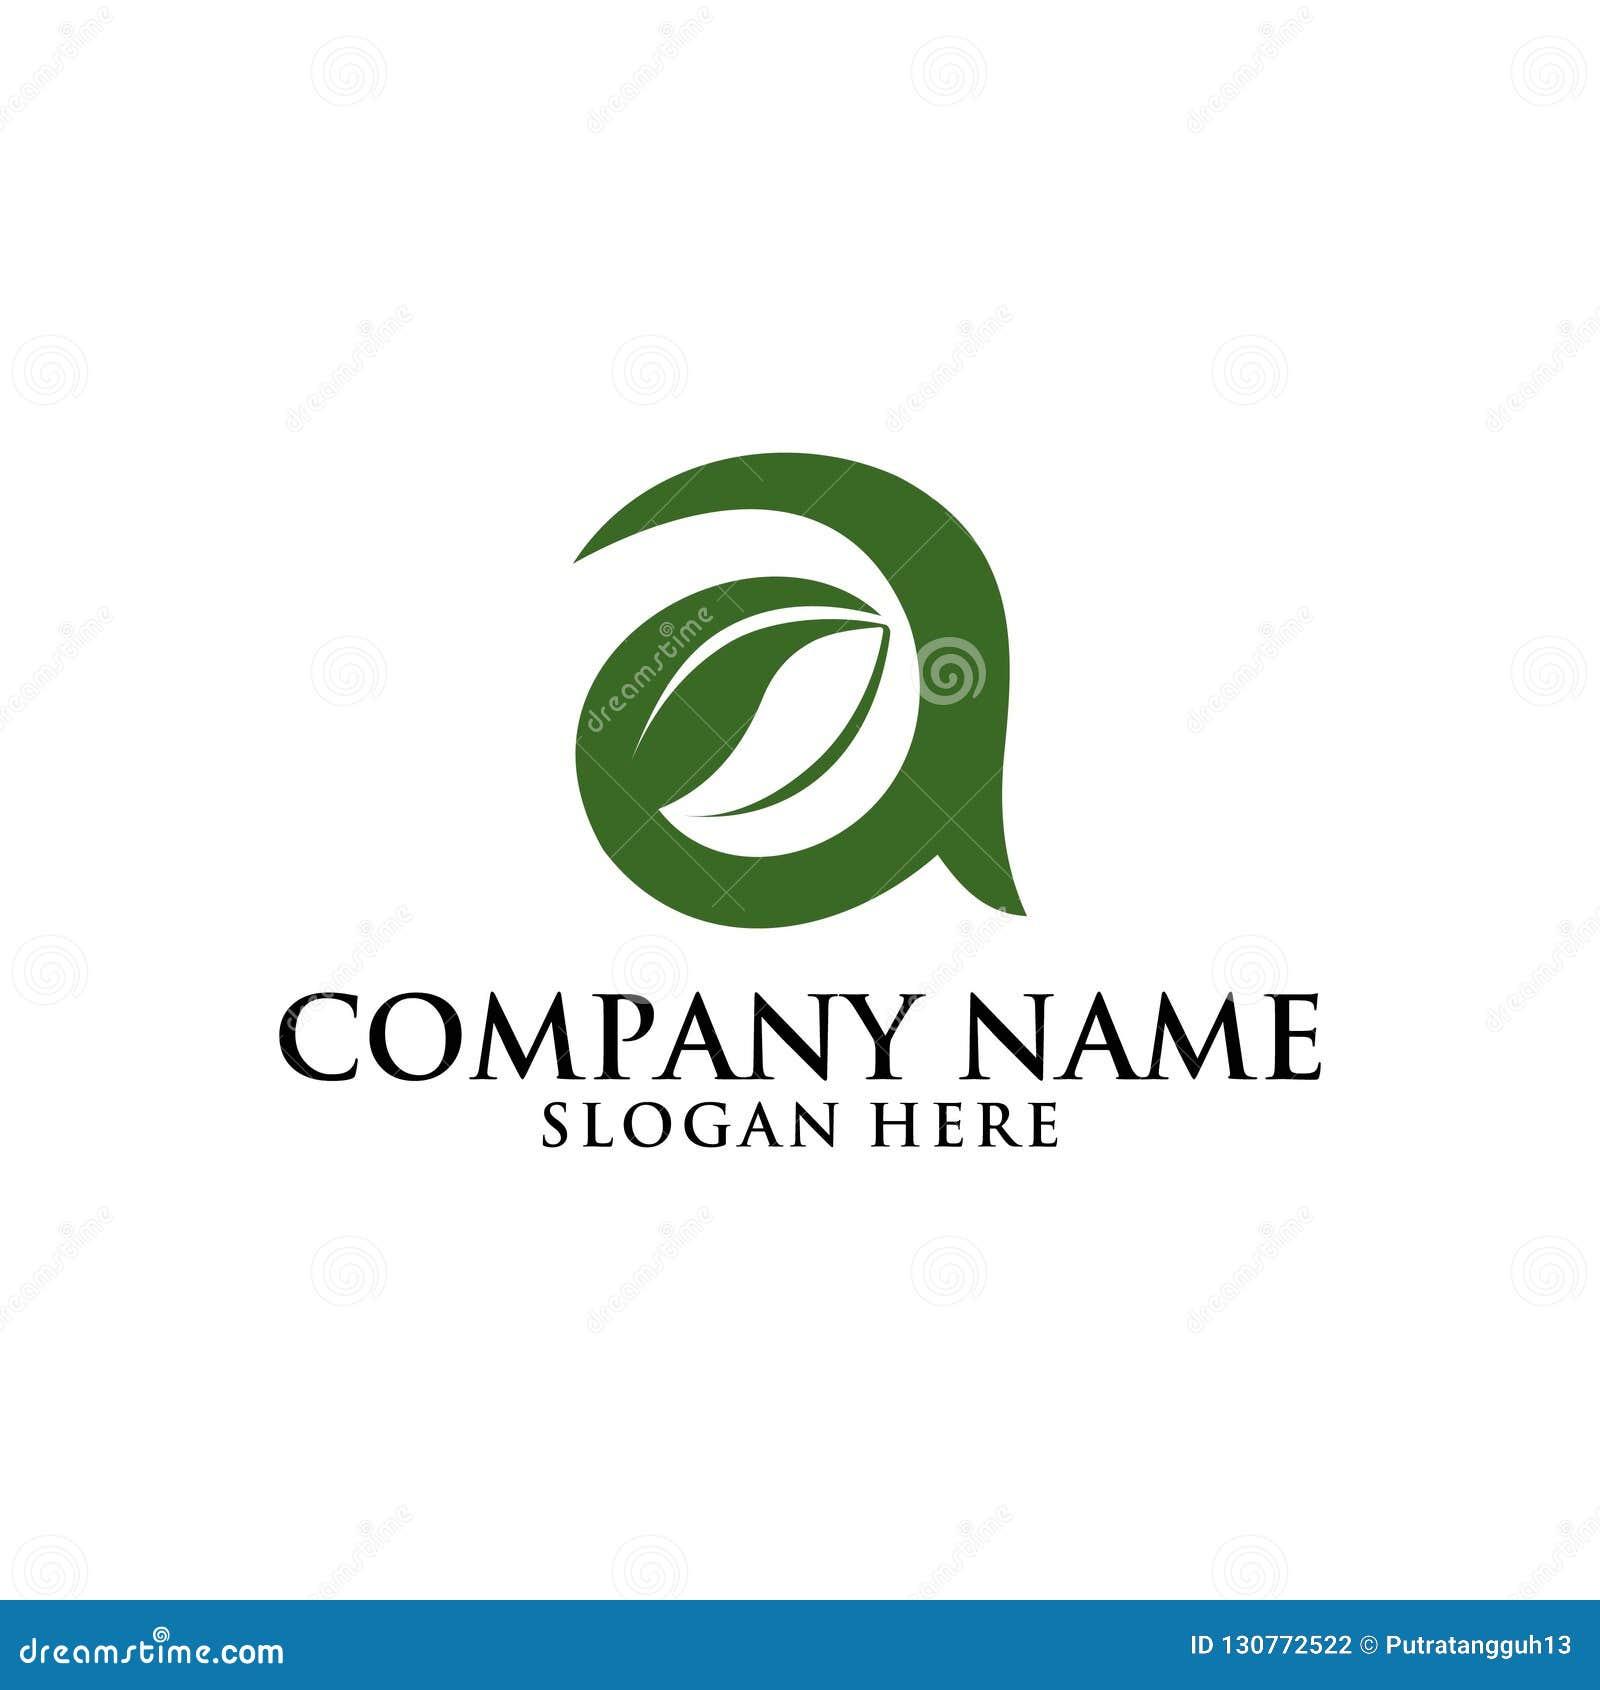 Ponga letras a un diseño del logotipo de la naturaleza